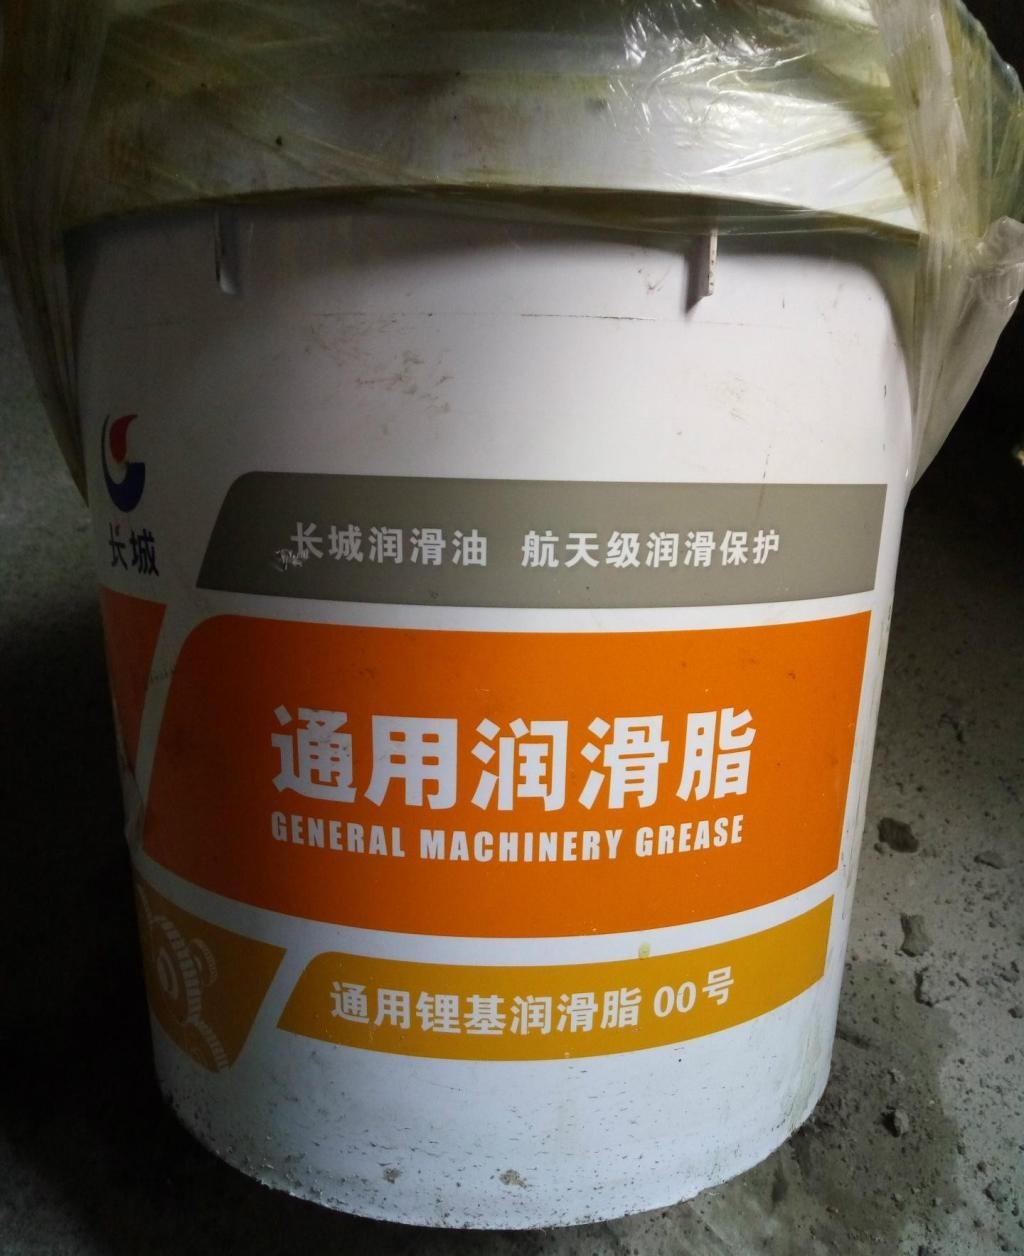 L-QB300导热油(武汉仓库)产品图片